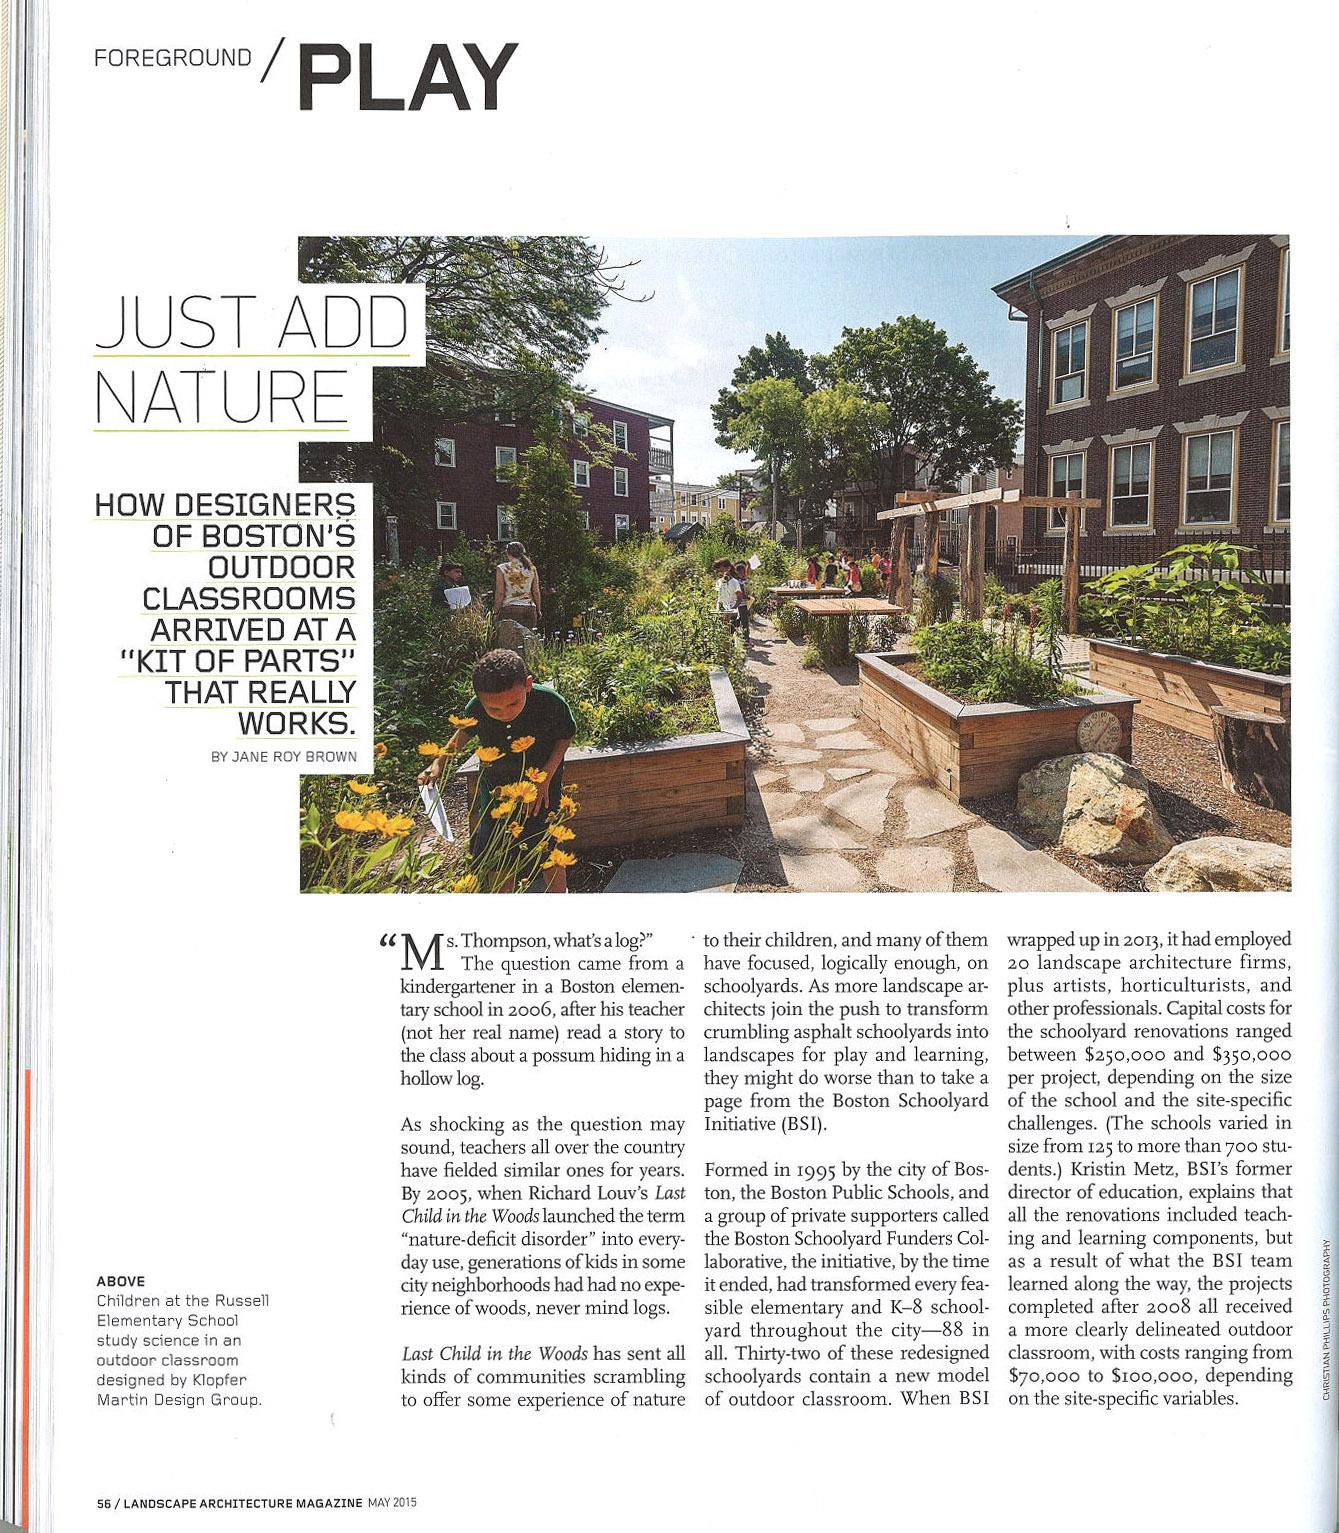 56 klopfer martin landscape architecture magazine.jpg